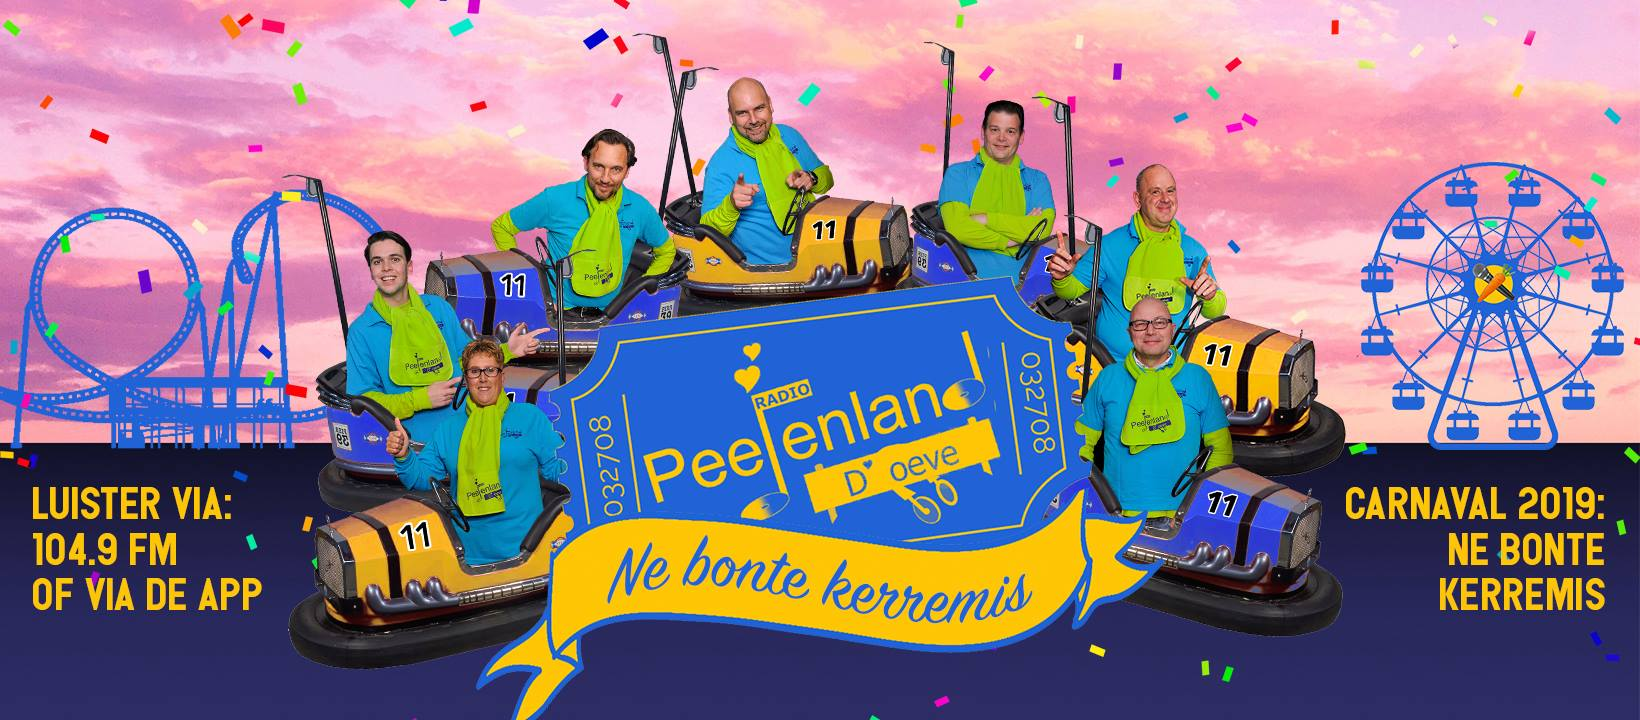 Radio Peejenland | Dé carnavalszender van D'oeve